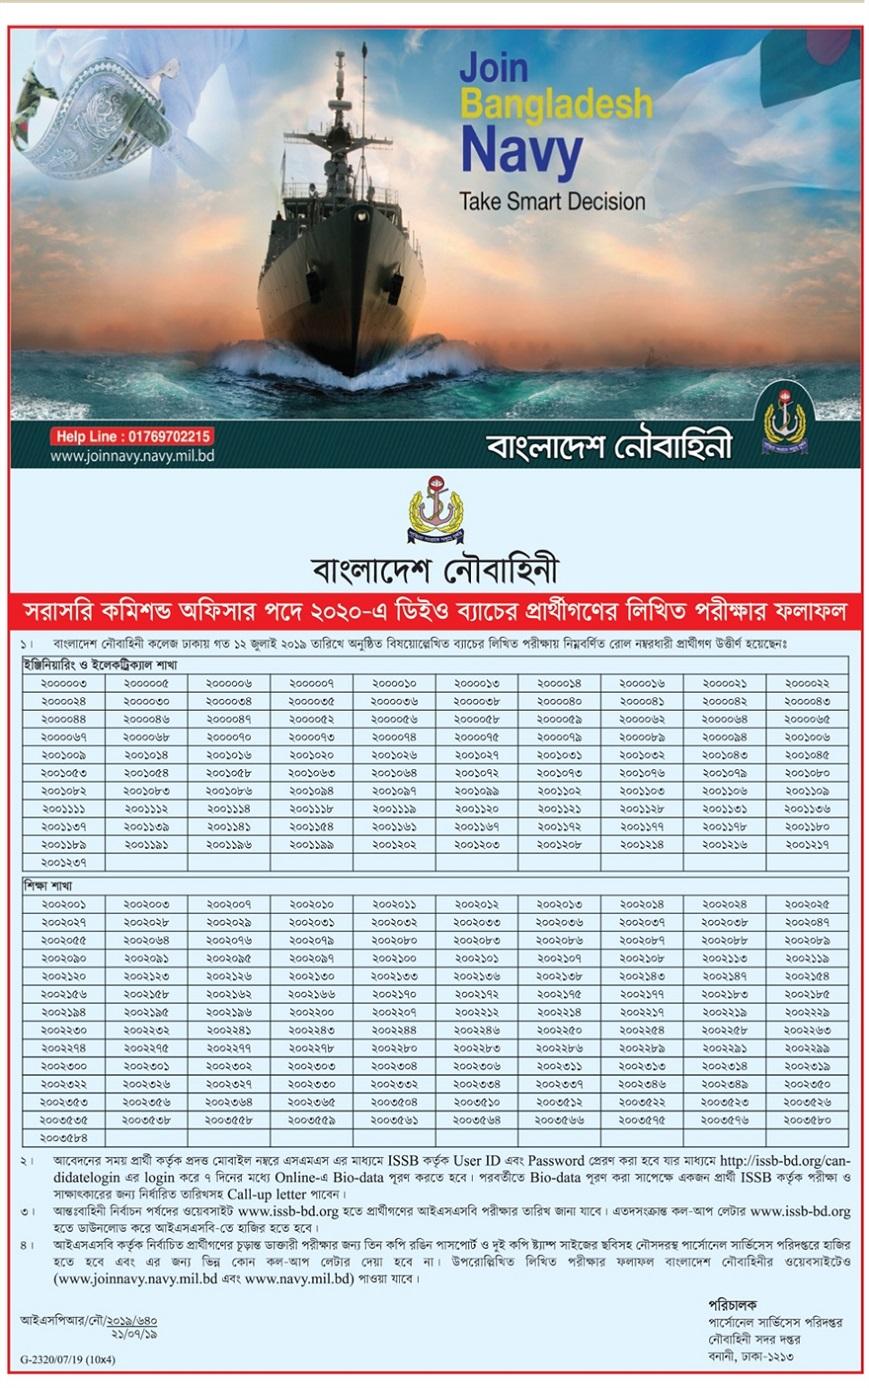 Bangladesh Navy Job Exam Result 2020